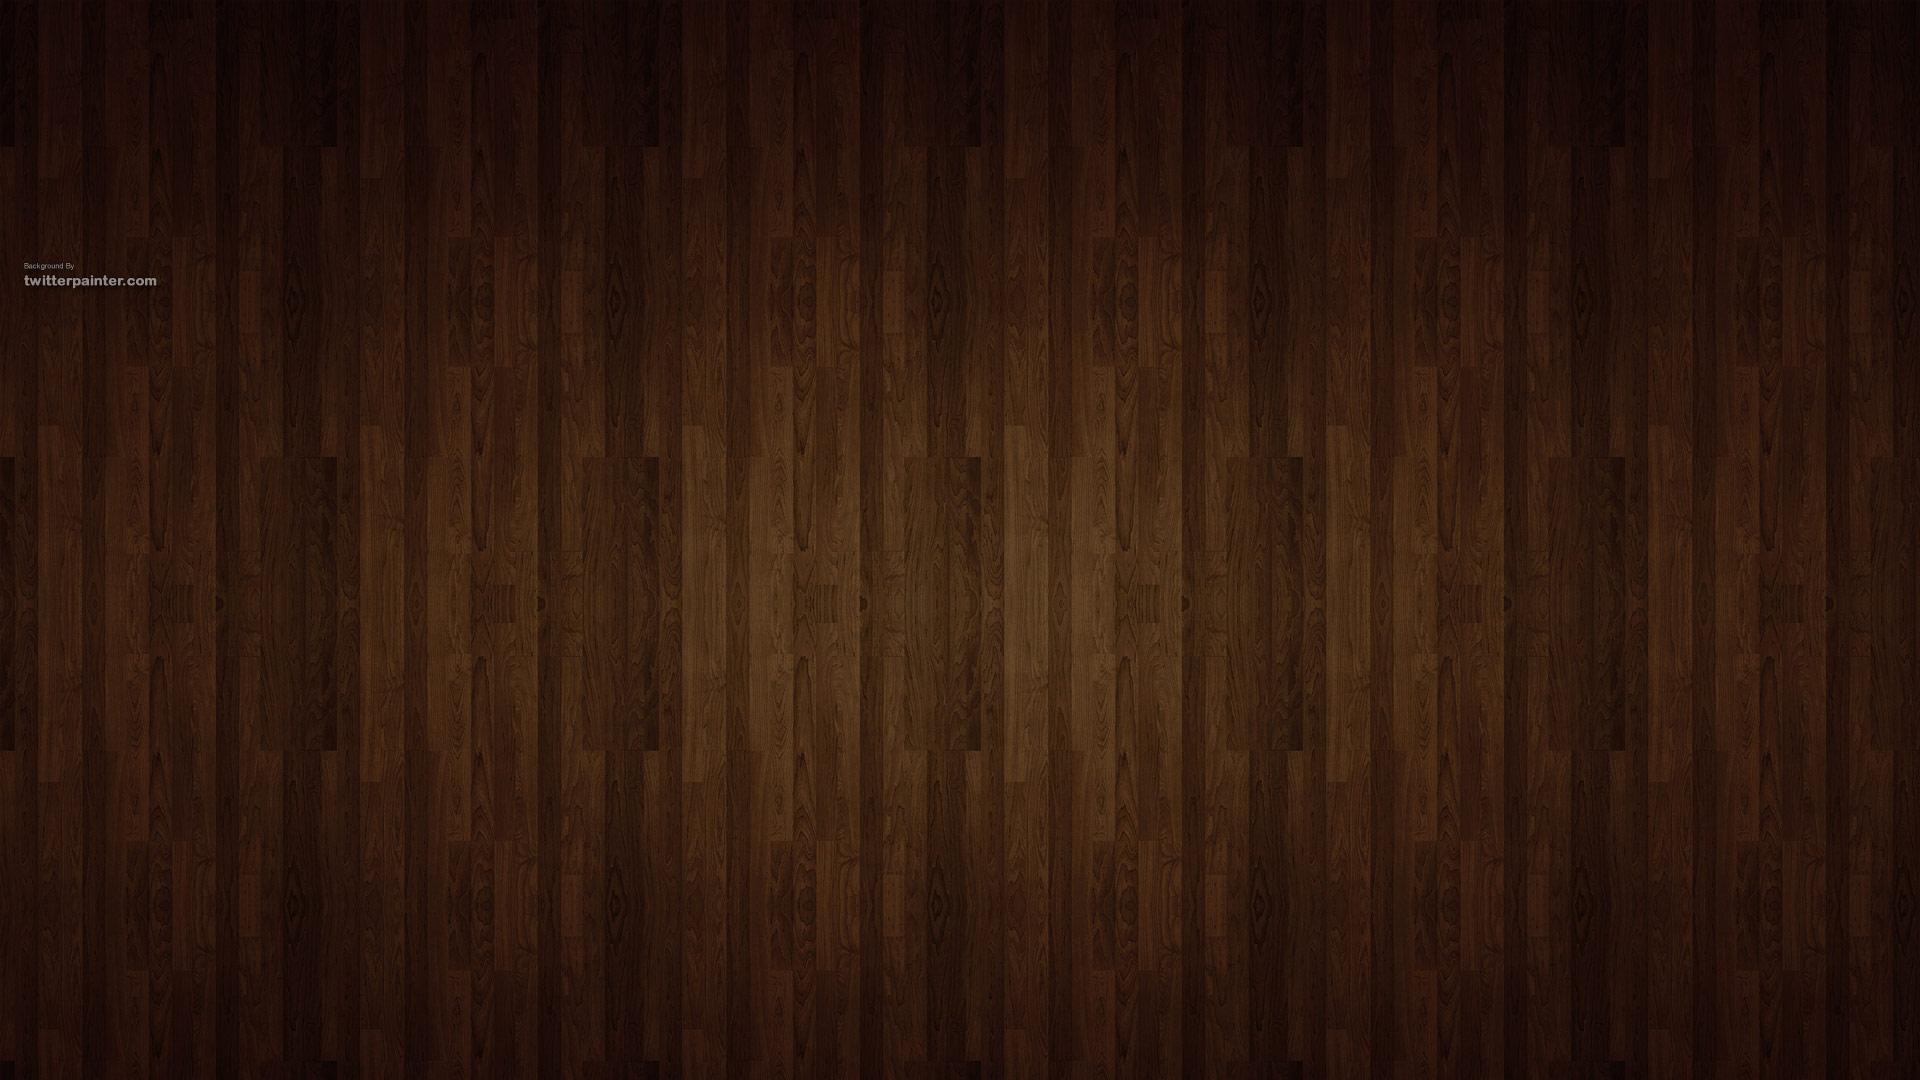 wallpapers background twitter wood dark backgrounds fantasyjpg 1920x1080